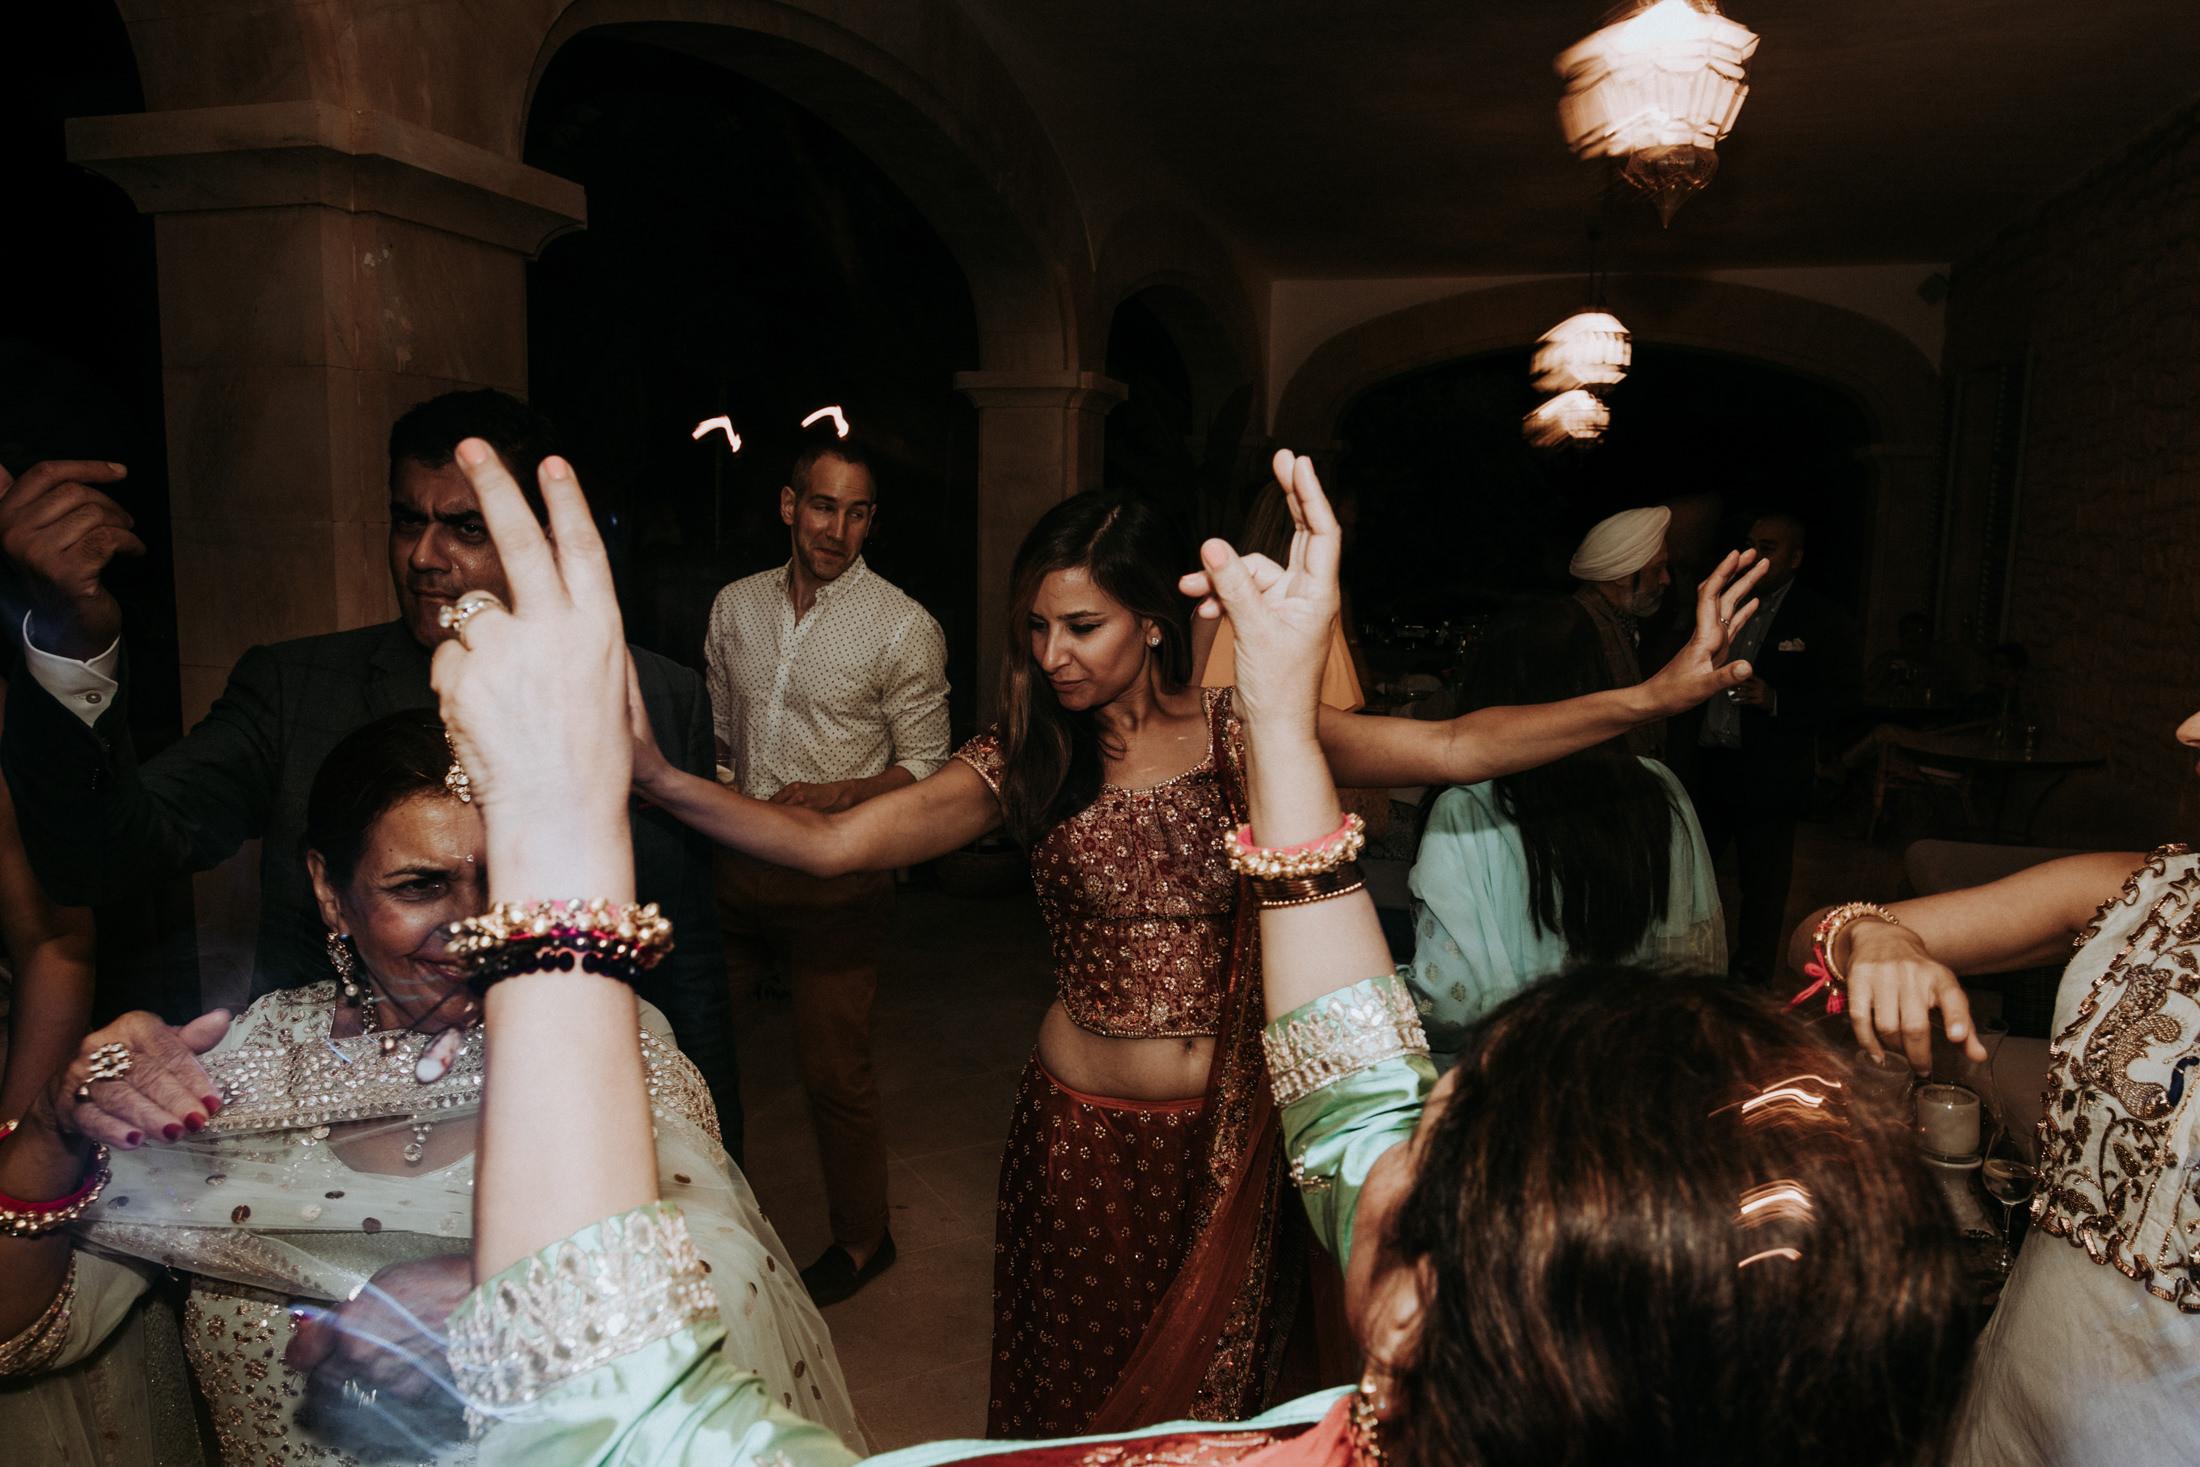 Wedding_Photographer_Mallorca_Daniela-Marquardt_Photography_New_York_Iceland_Tuscany_Santorini_Portugal_Austria_Bavaria_Elopement_Hochzeitsfotograf_AntjeRajat1_63